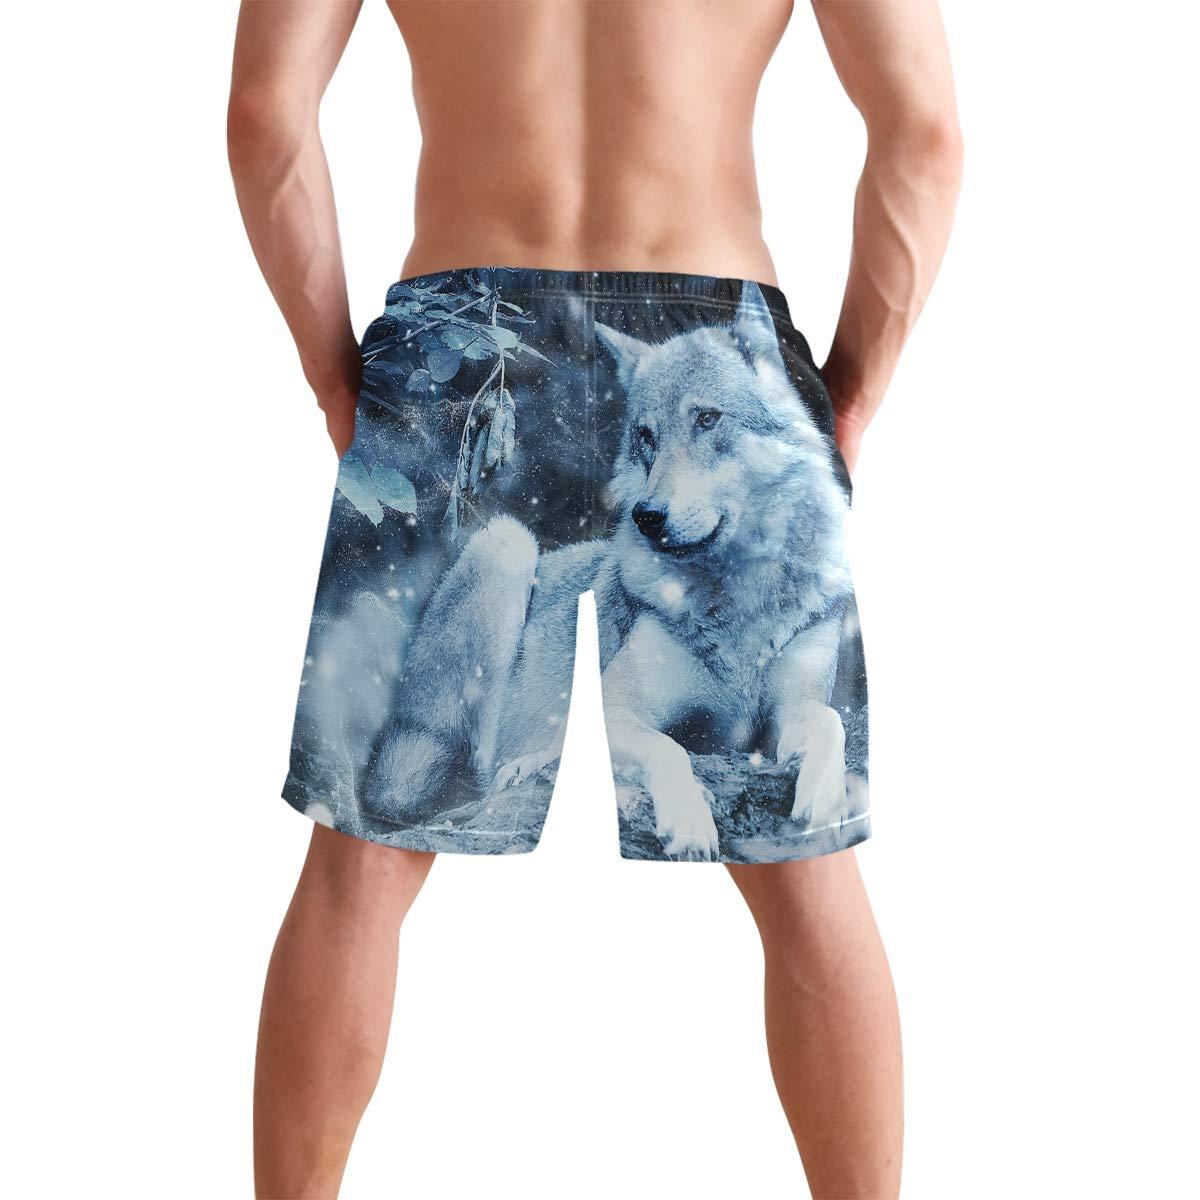 Mens Beach Swim Trunks Wolf Snowflake Night Boxer Swimsuit Underwear Board Shorts with Pocket